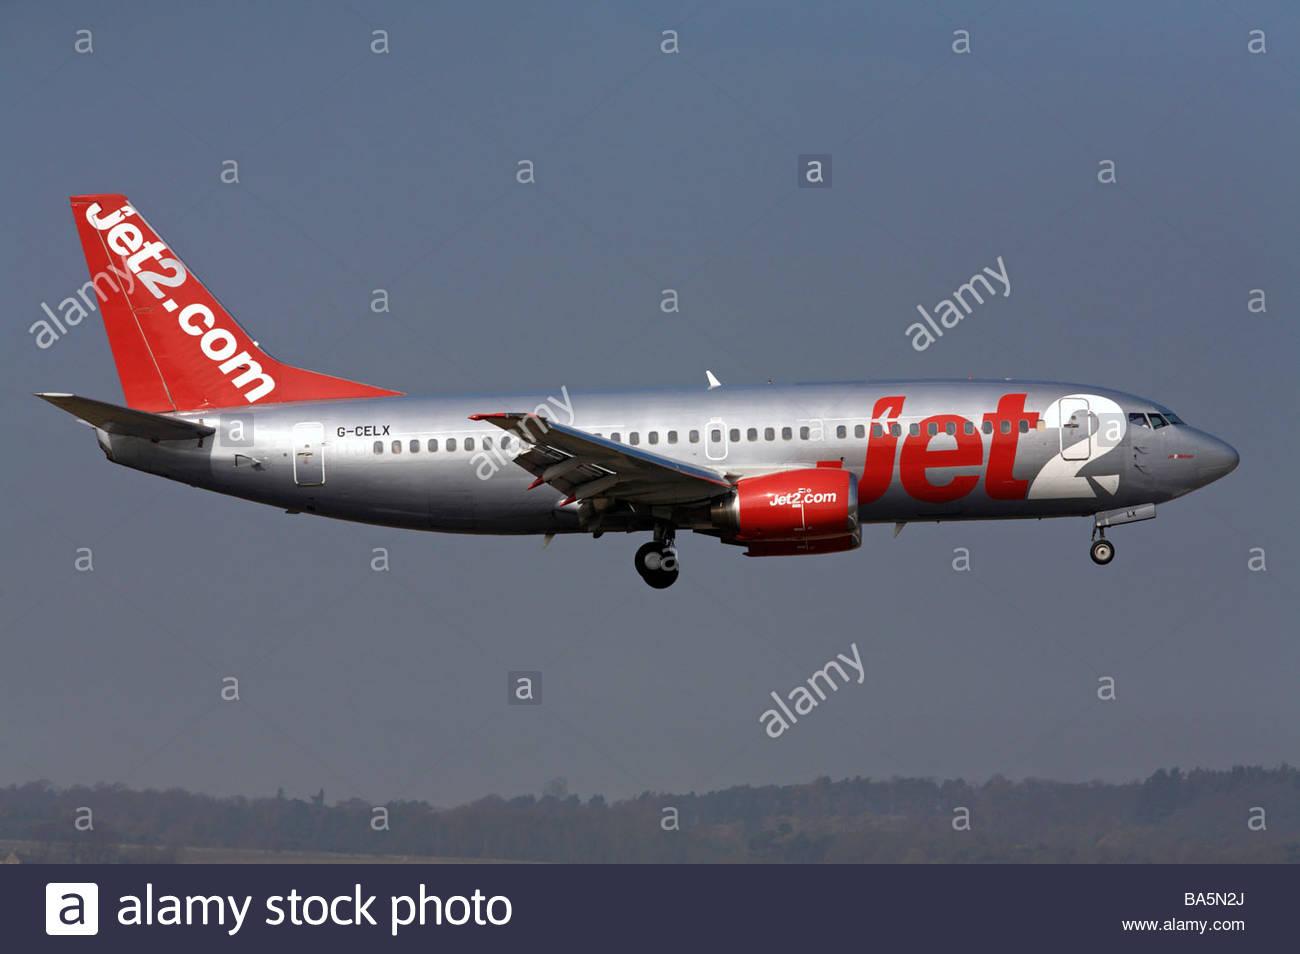 Jet2.com flight approaching runway - Stock Image